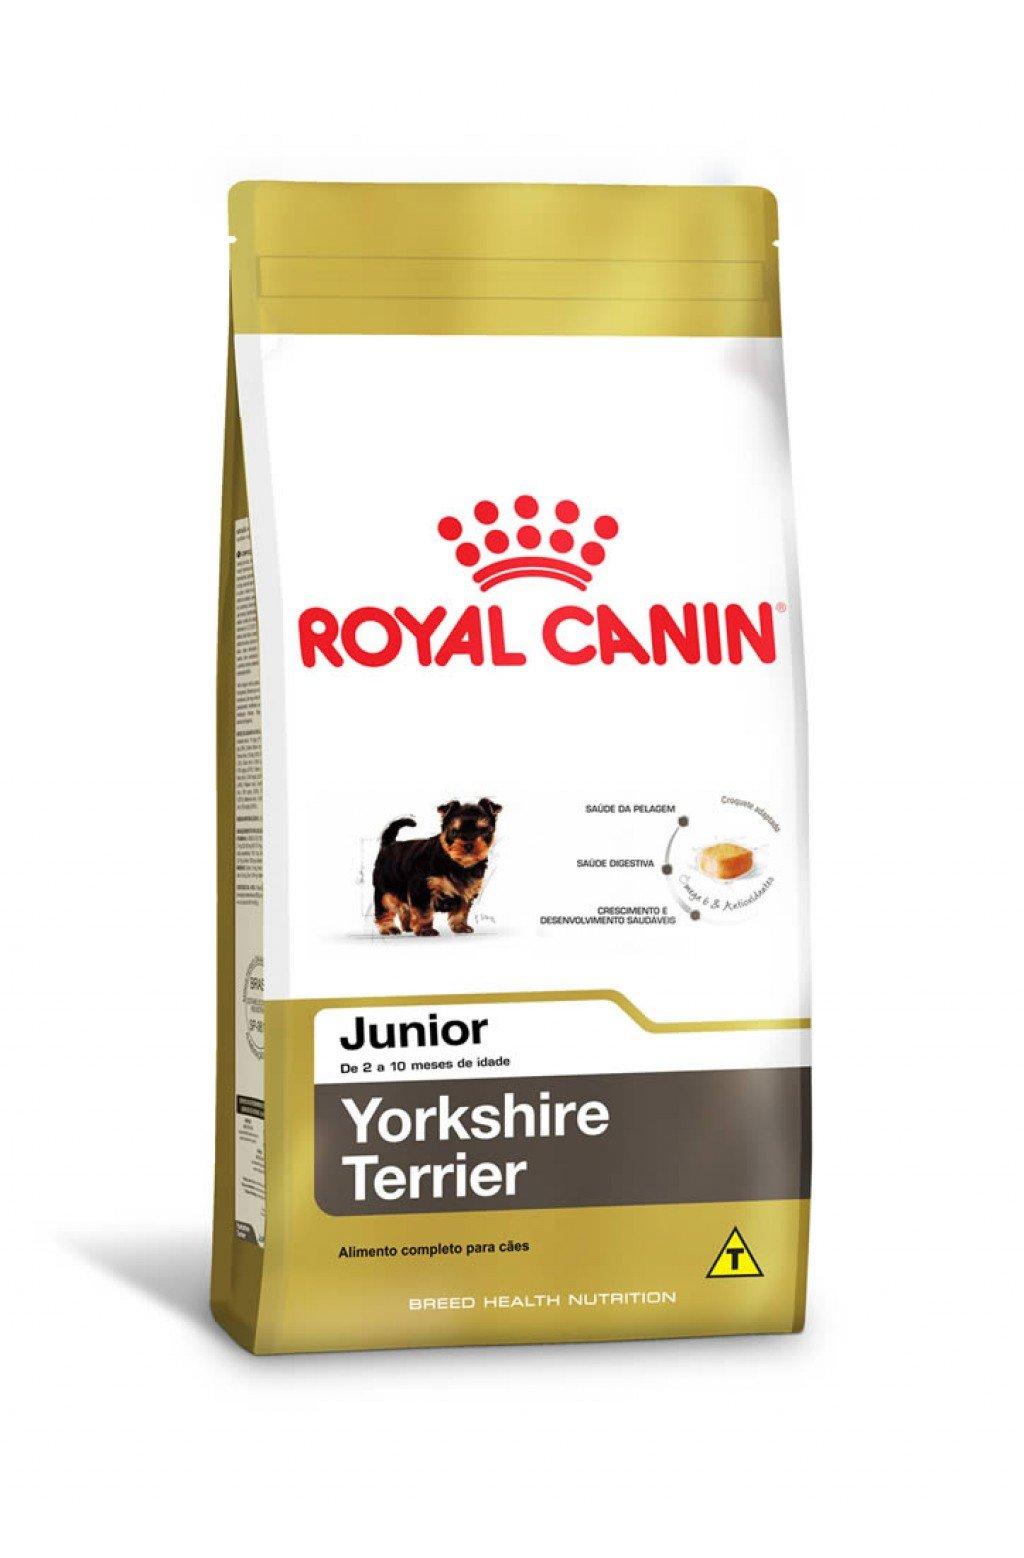 Ração Royal Canin Yorkshire Terrier Junior 1,0 kg